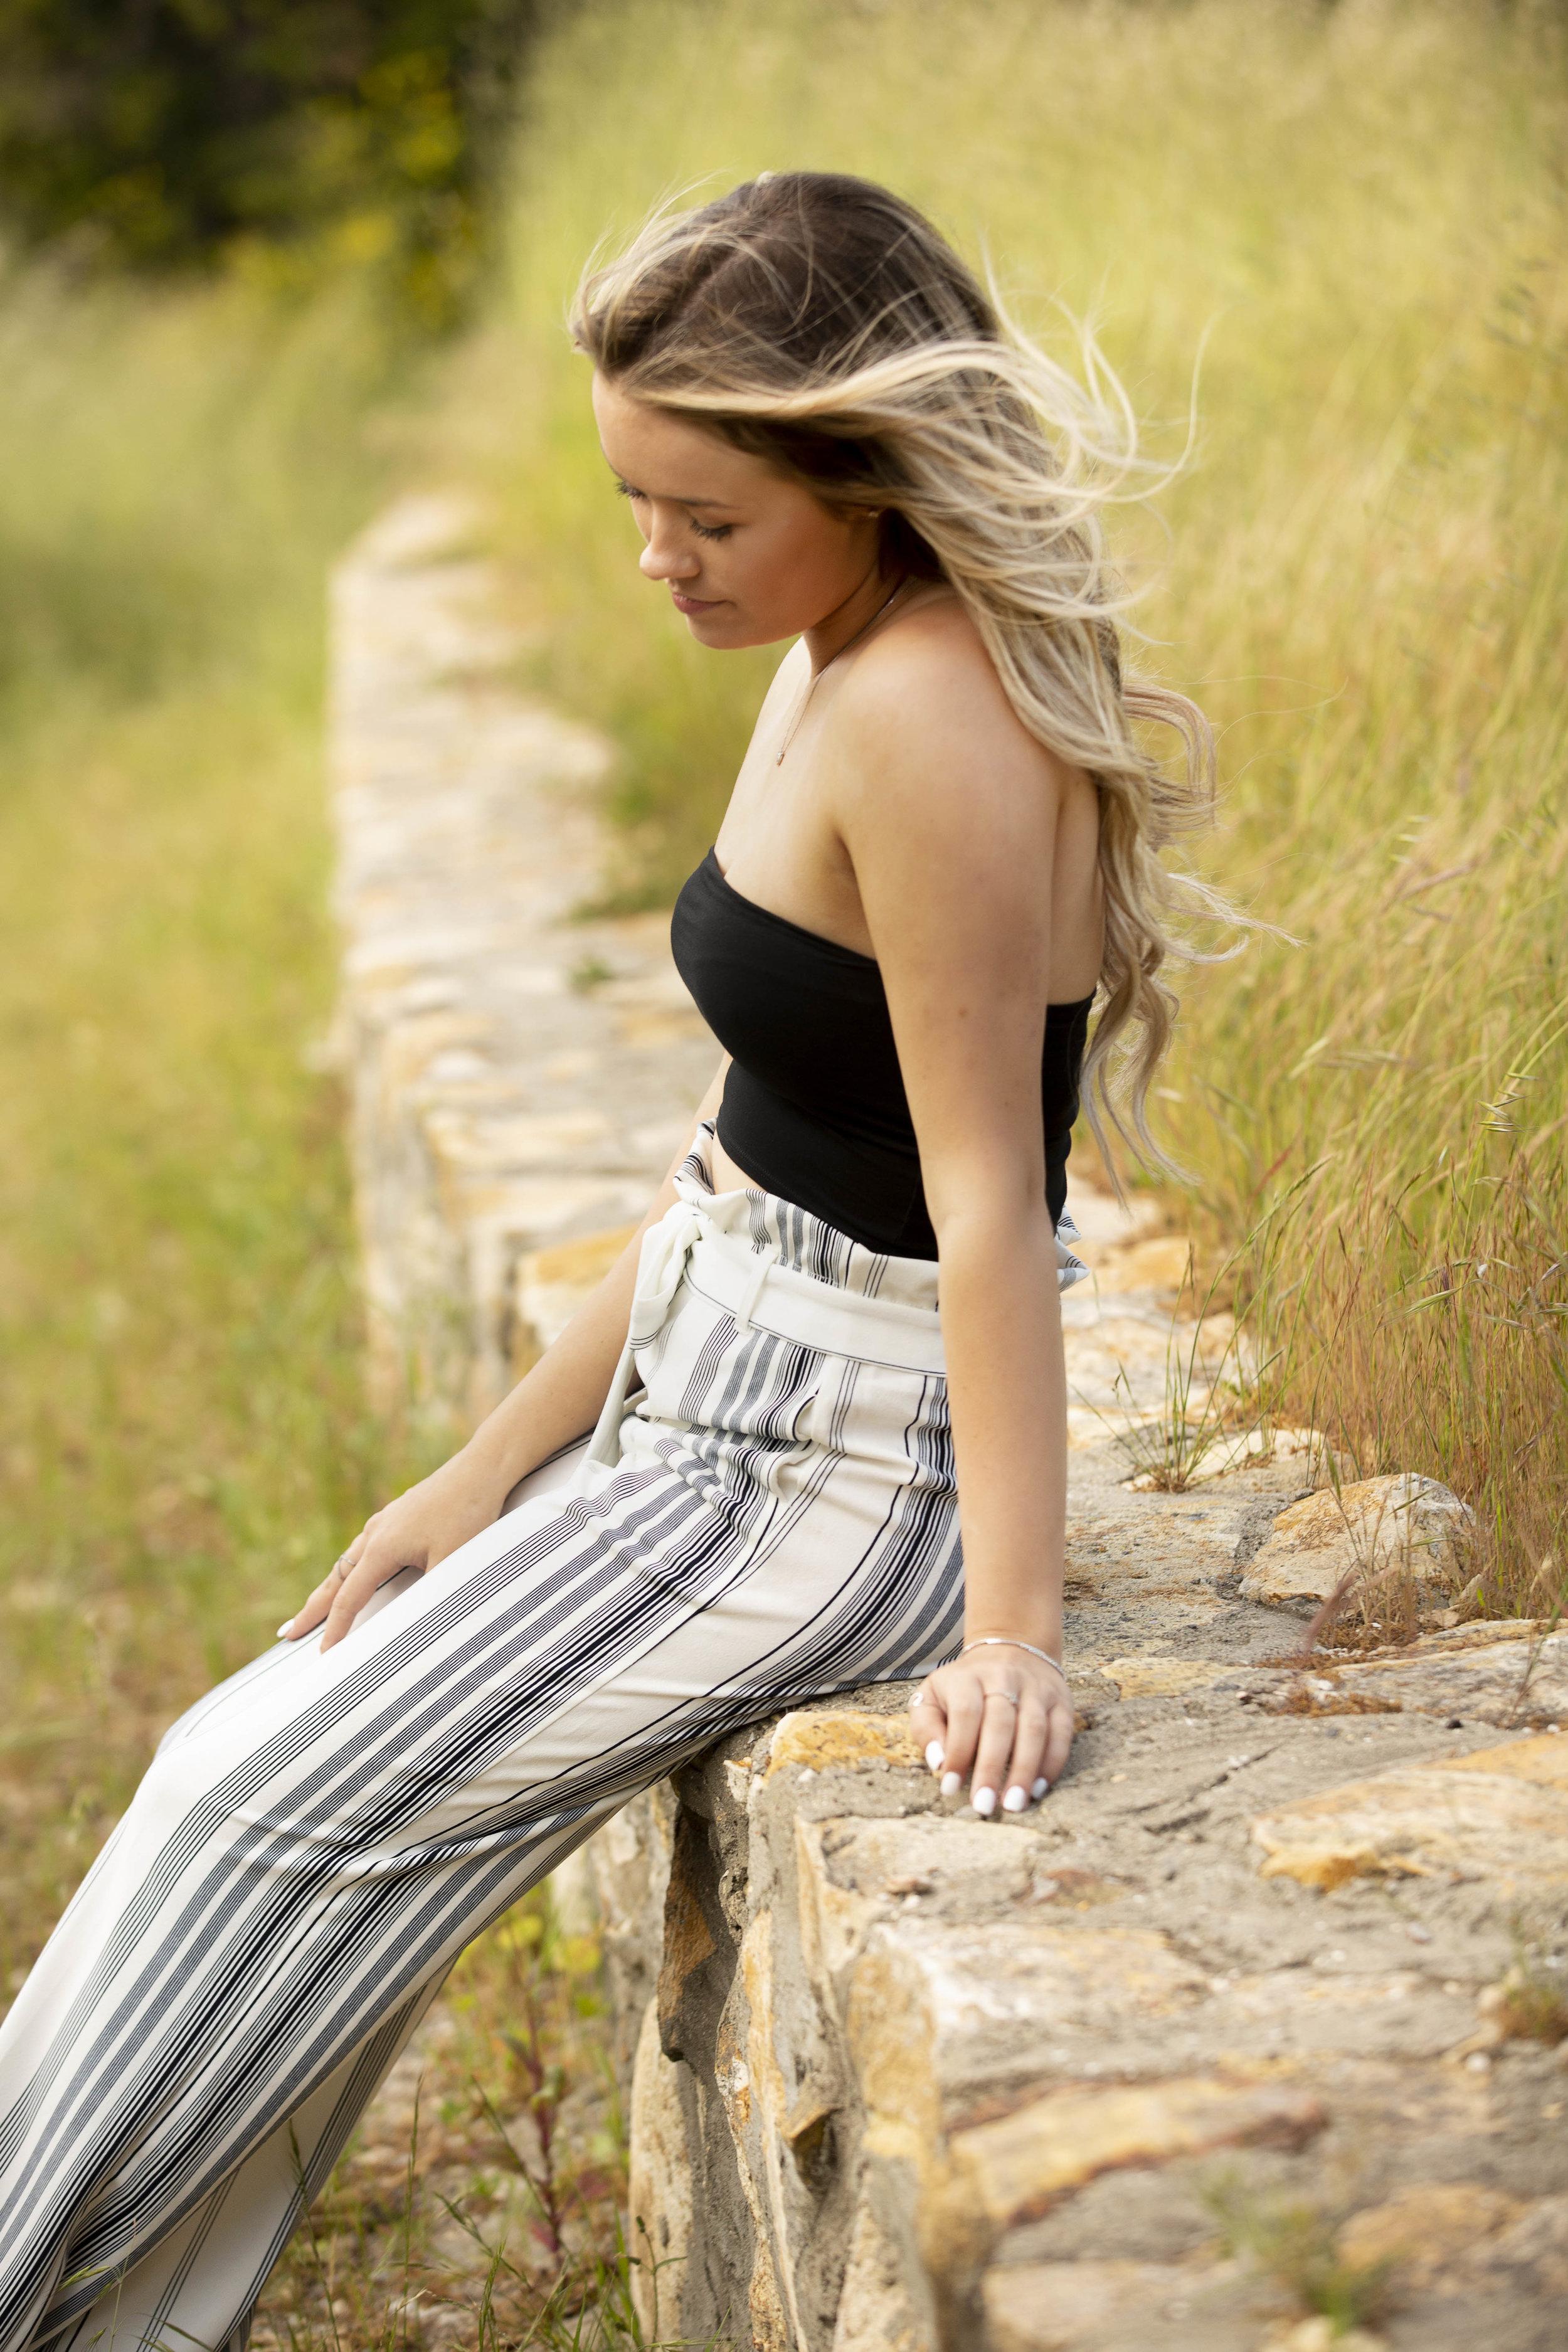 KylieKaufmannBlogPost-2.jpg